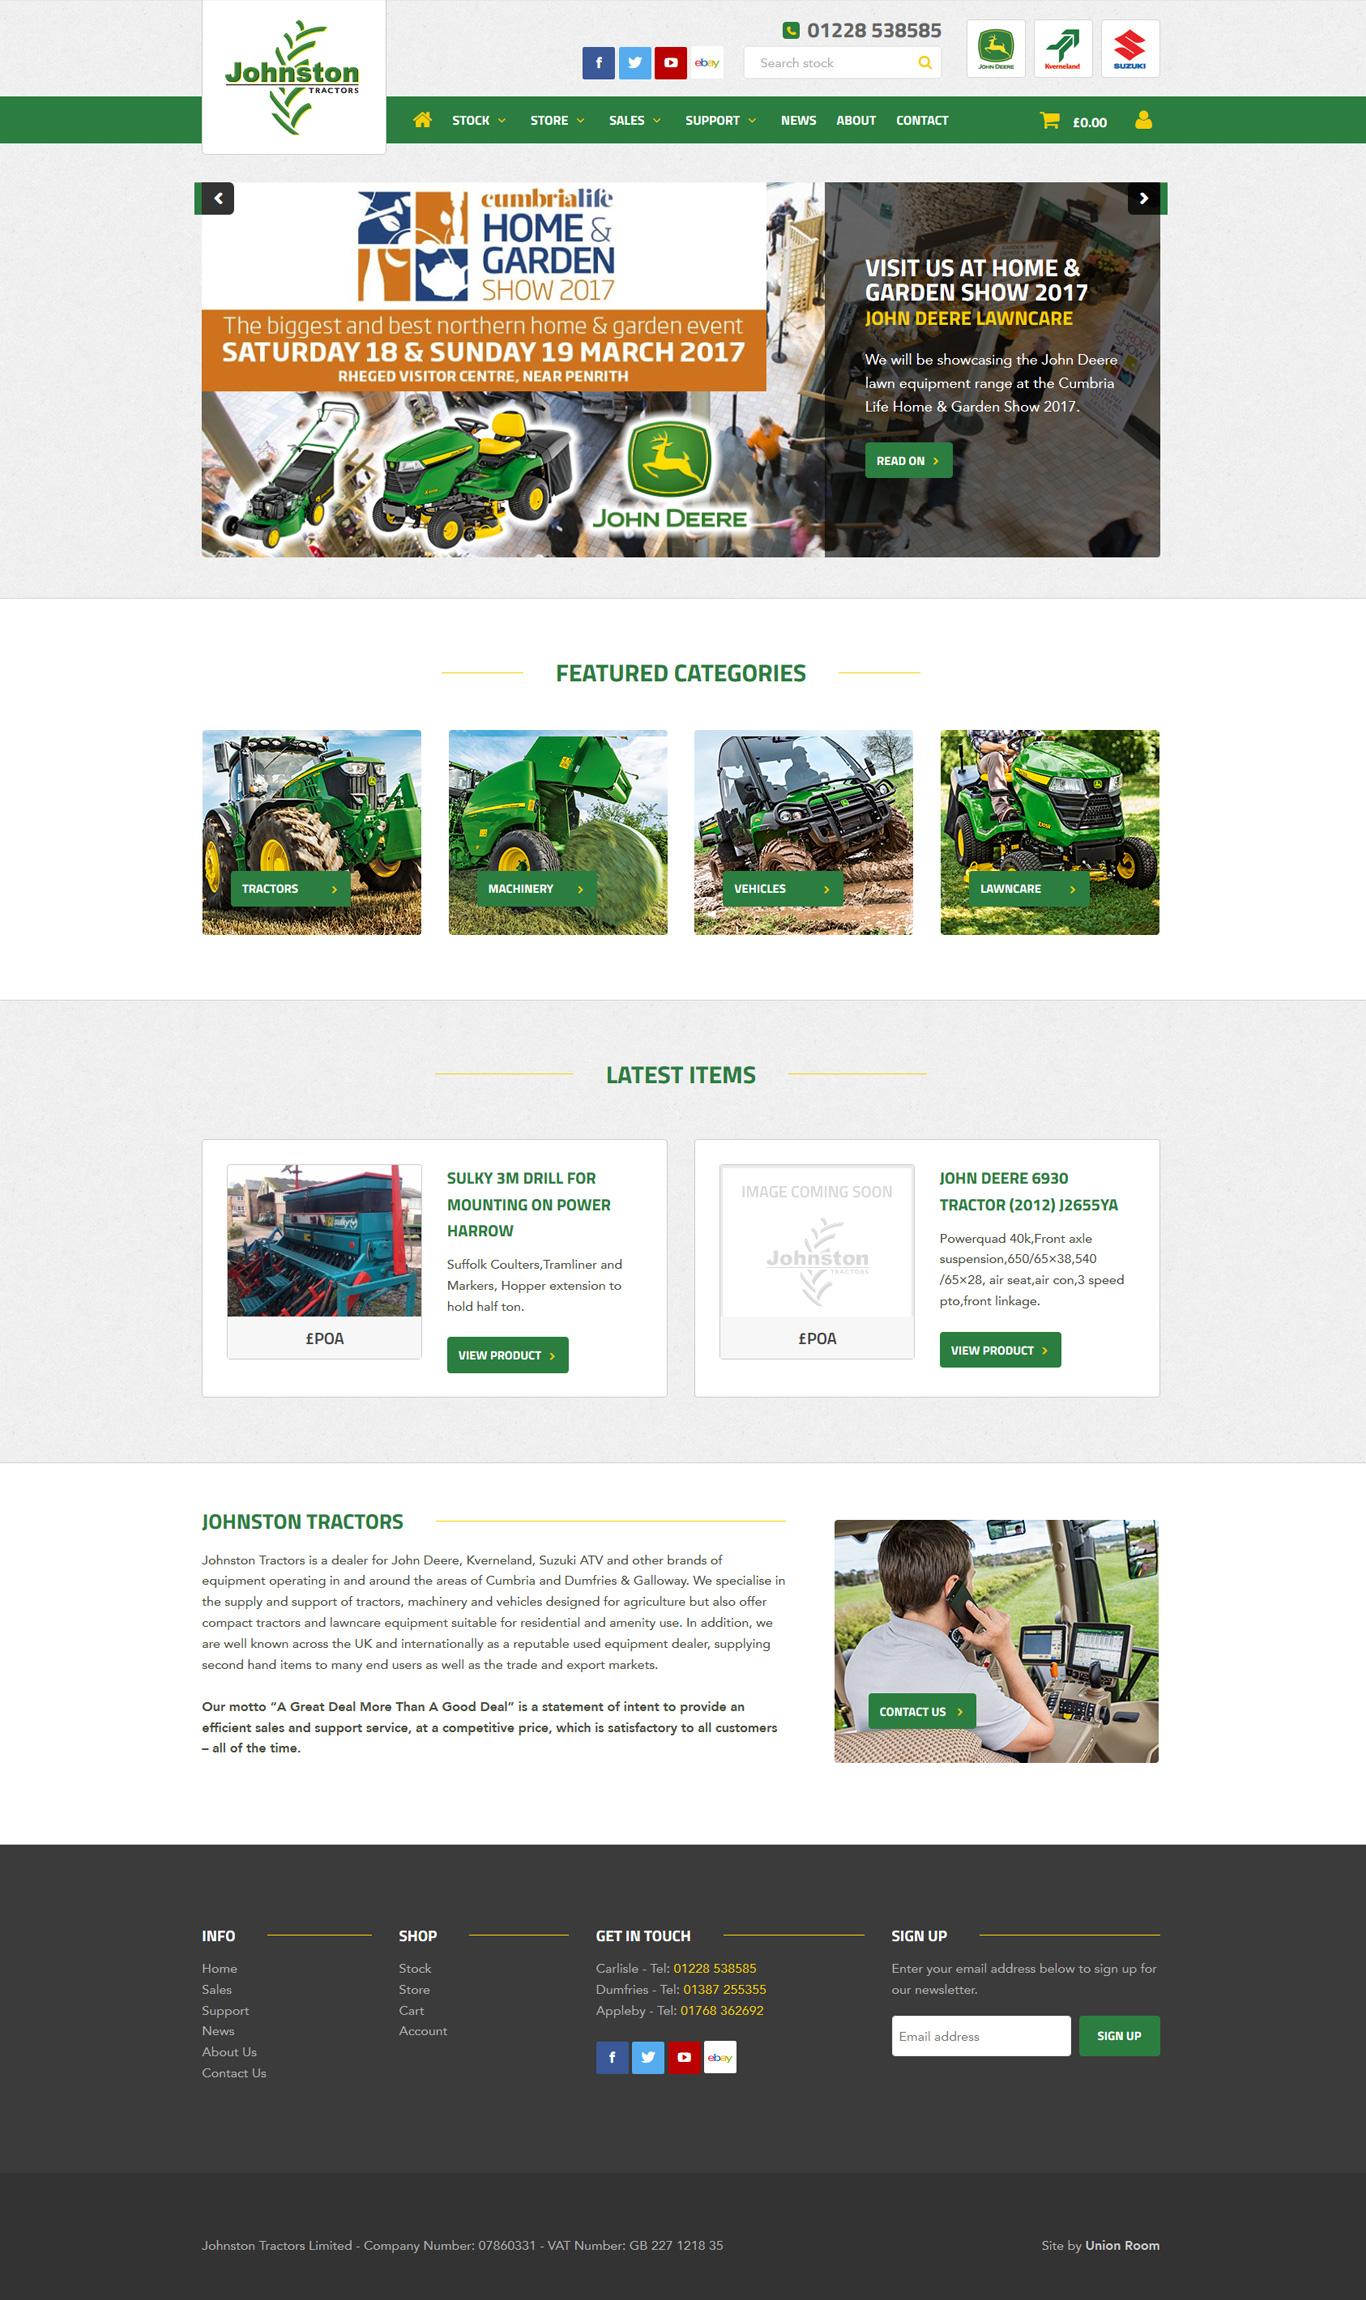 Johnston Tractors